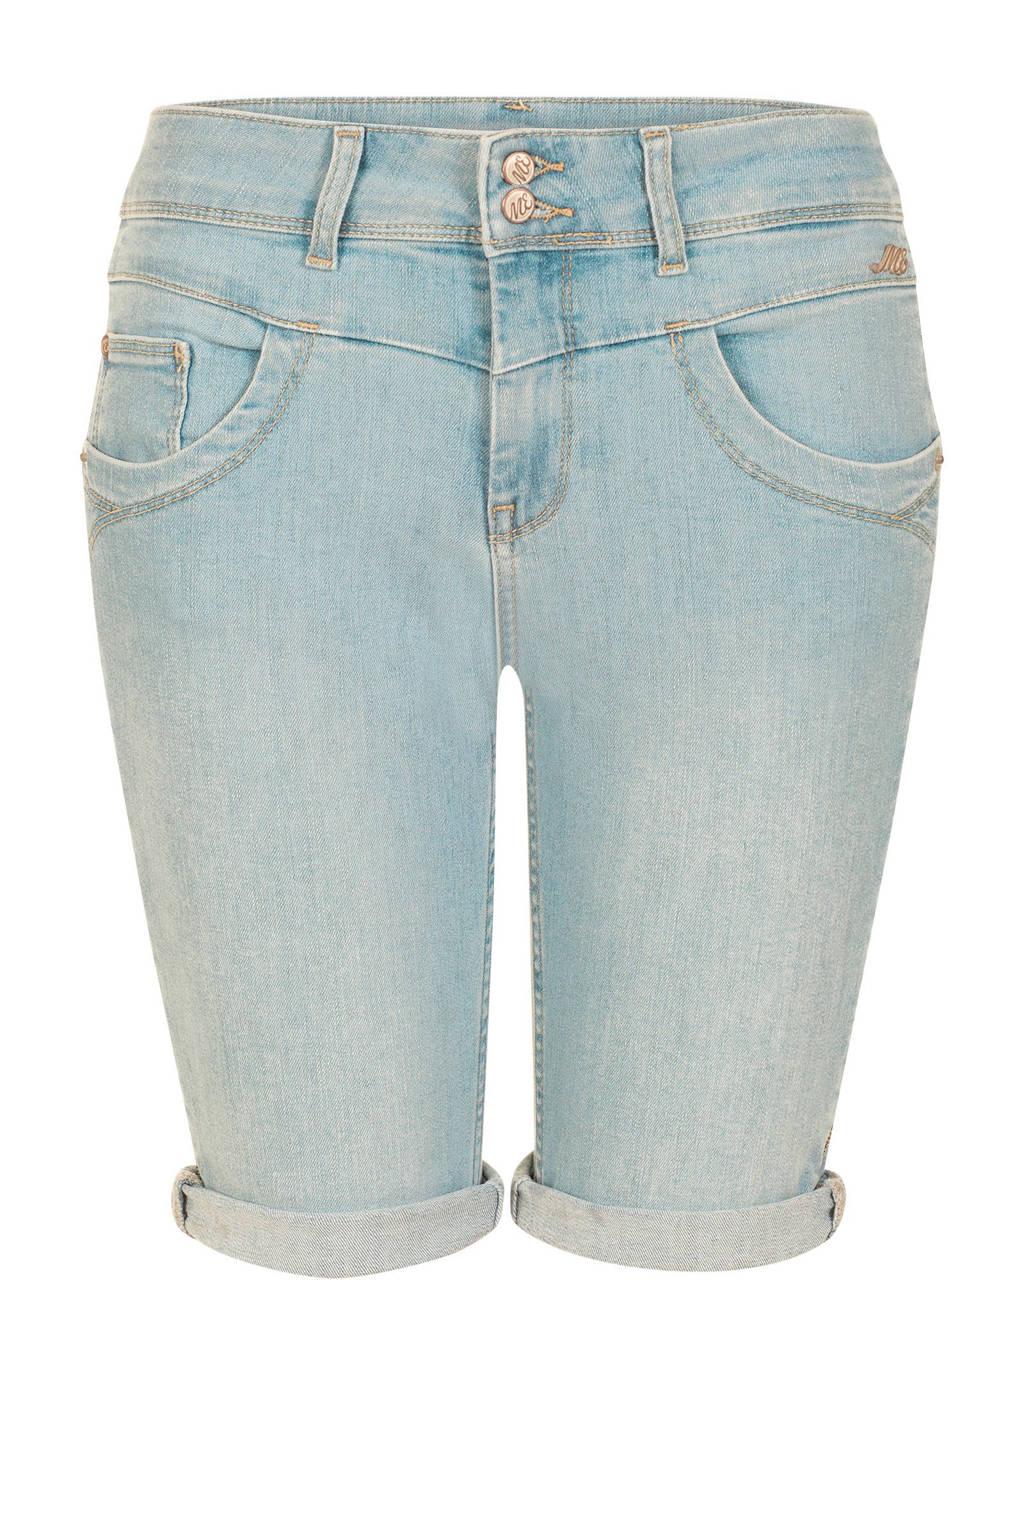 Miss Etam Regulier slim fit jeans short, Light denim